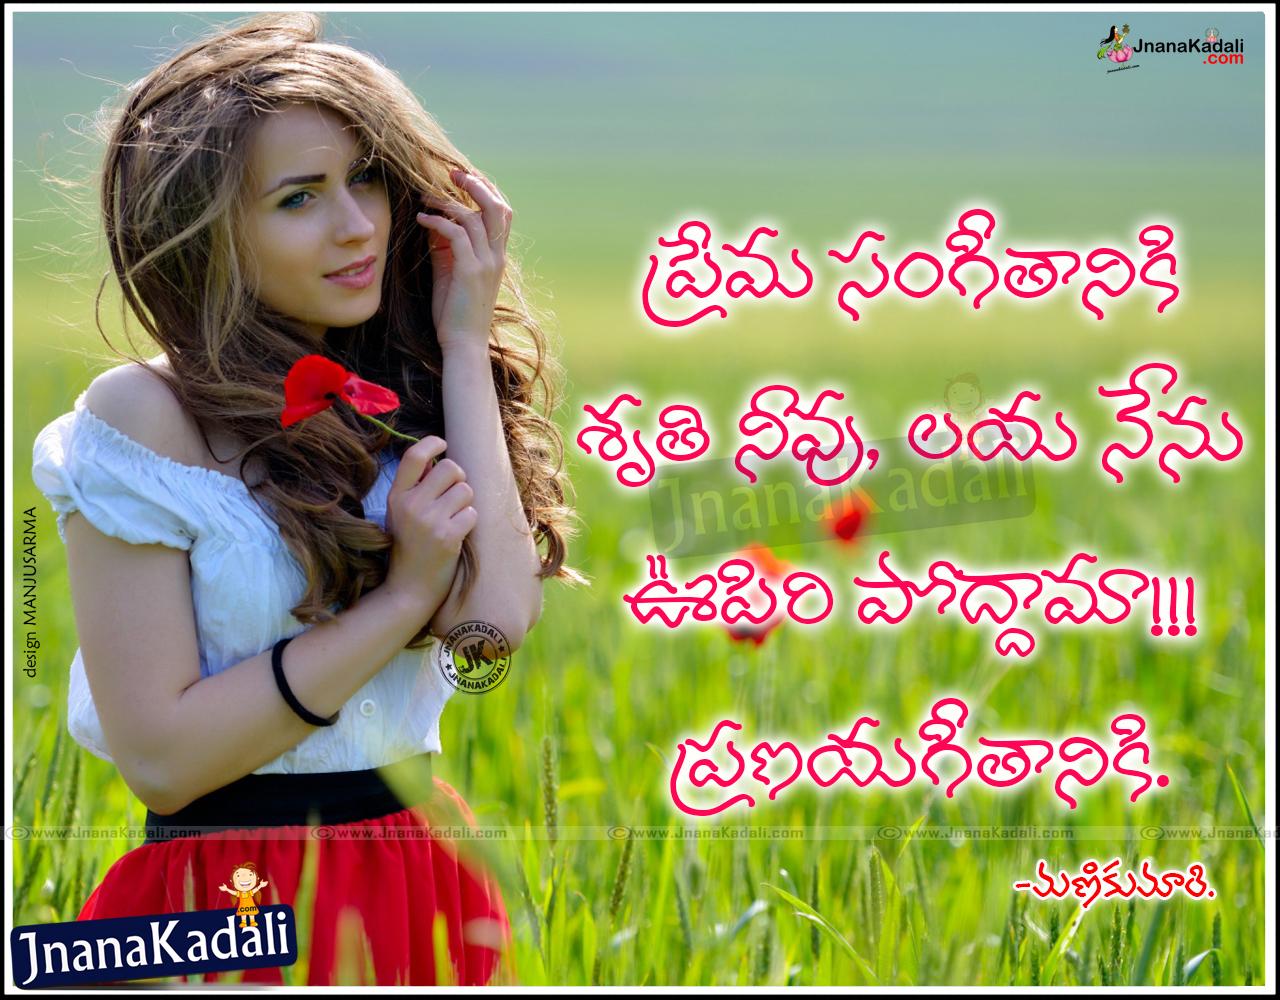 Surprising Heart Touching Love Quotes In Telugu Jnana Kadali Com Telugu Personalised Birthday Cards Bromeletsinfo